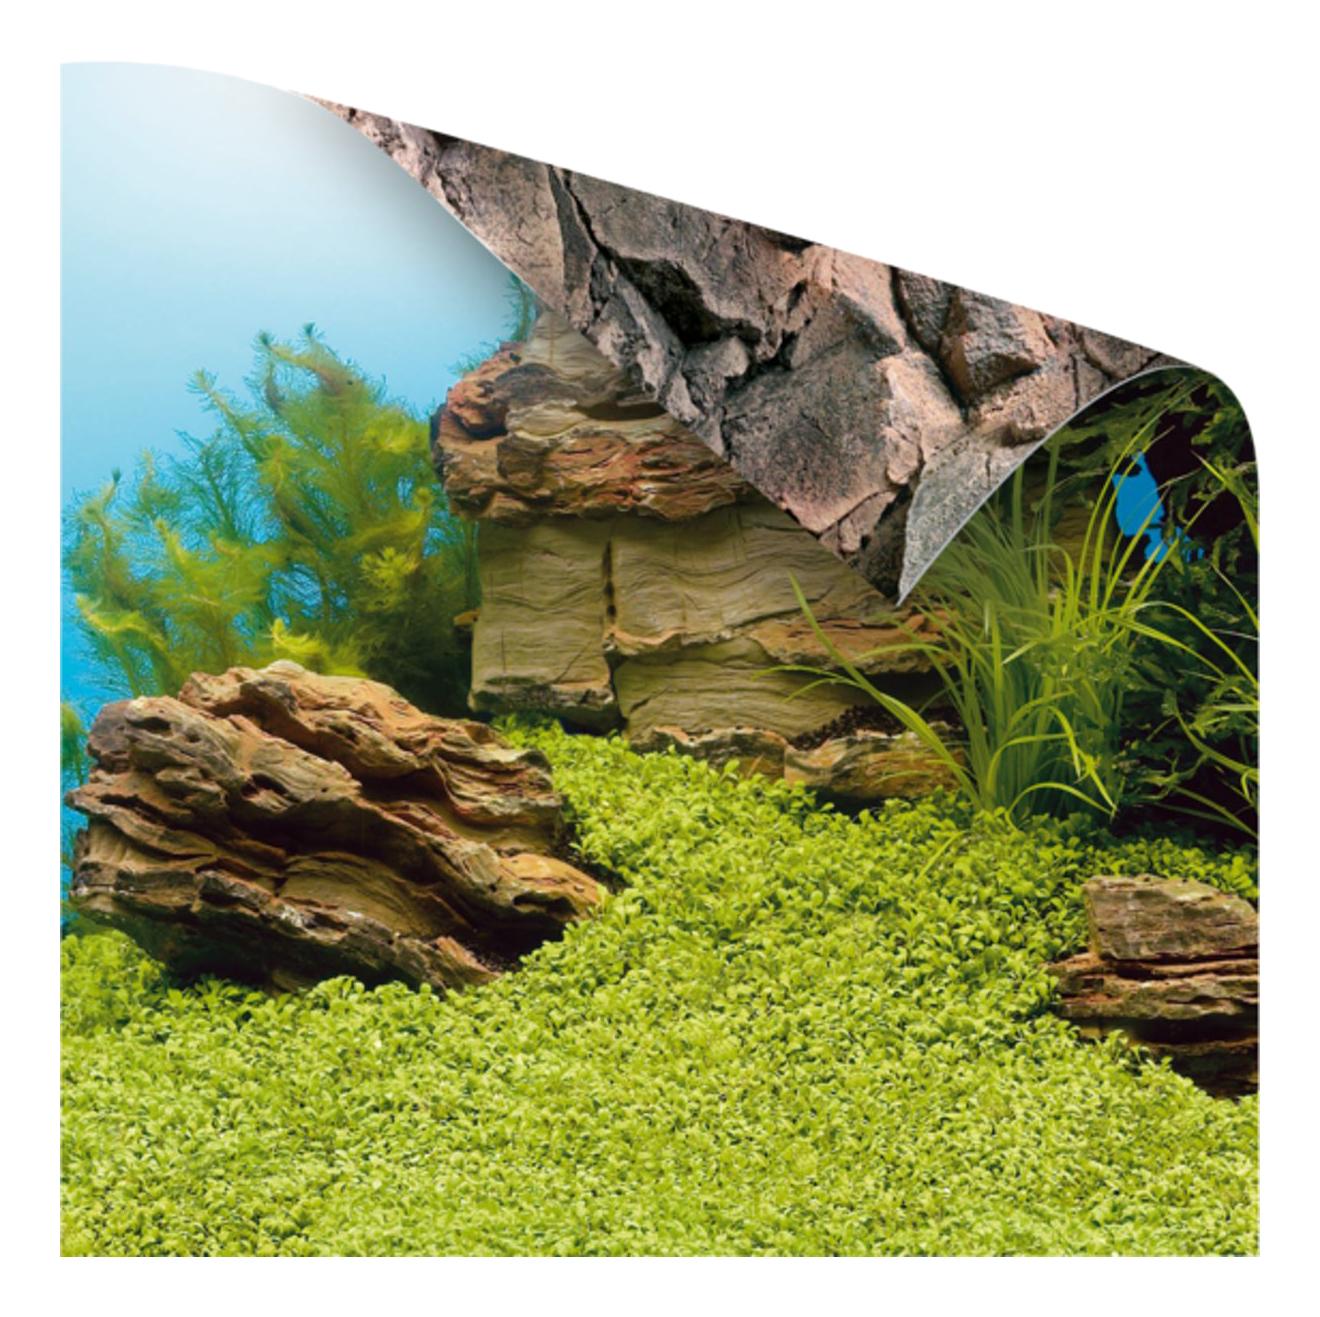 Фон для аквариума JUWEL Poster 1 S 86250